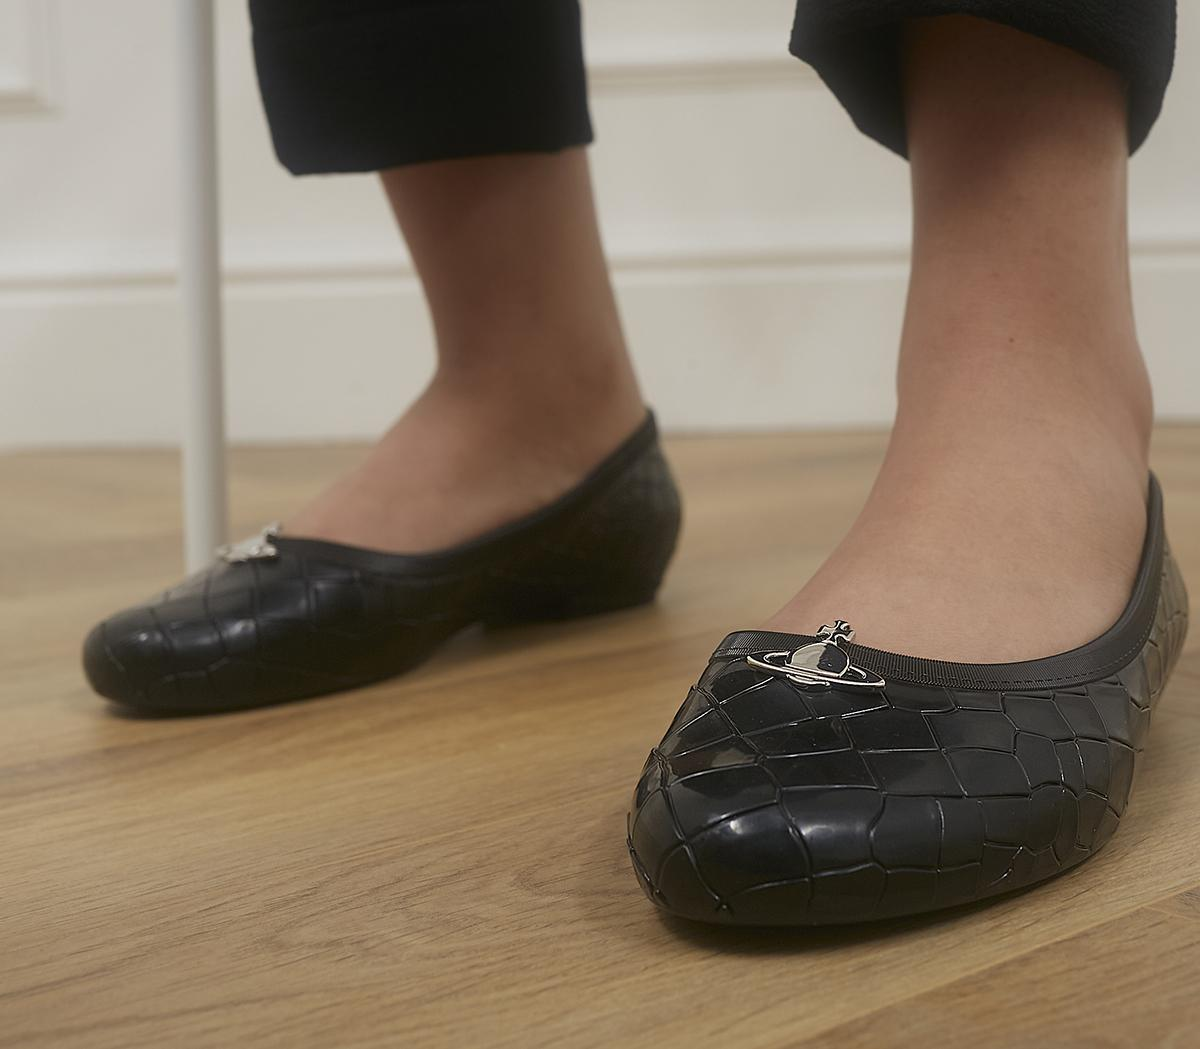 Vw Margot Orb Shoes